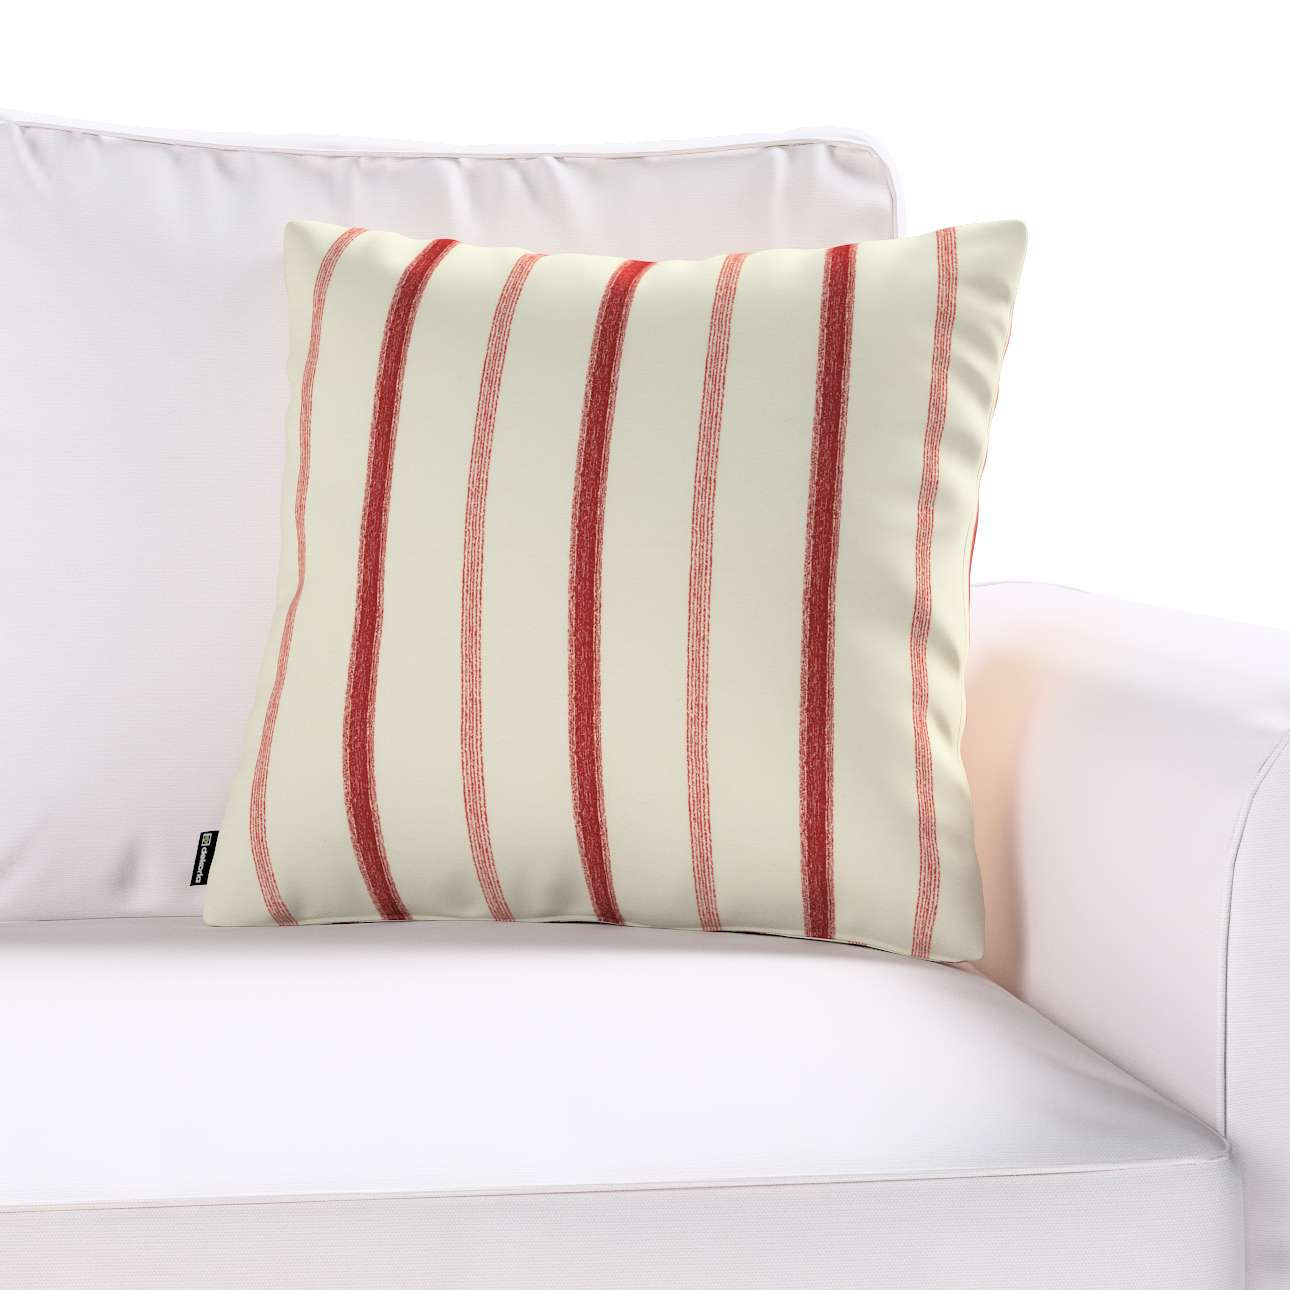 Kinga cushion cover 43 x 43 cm (17 x 17 inch) in collection Avinon, fabric: 129-15